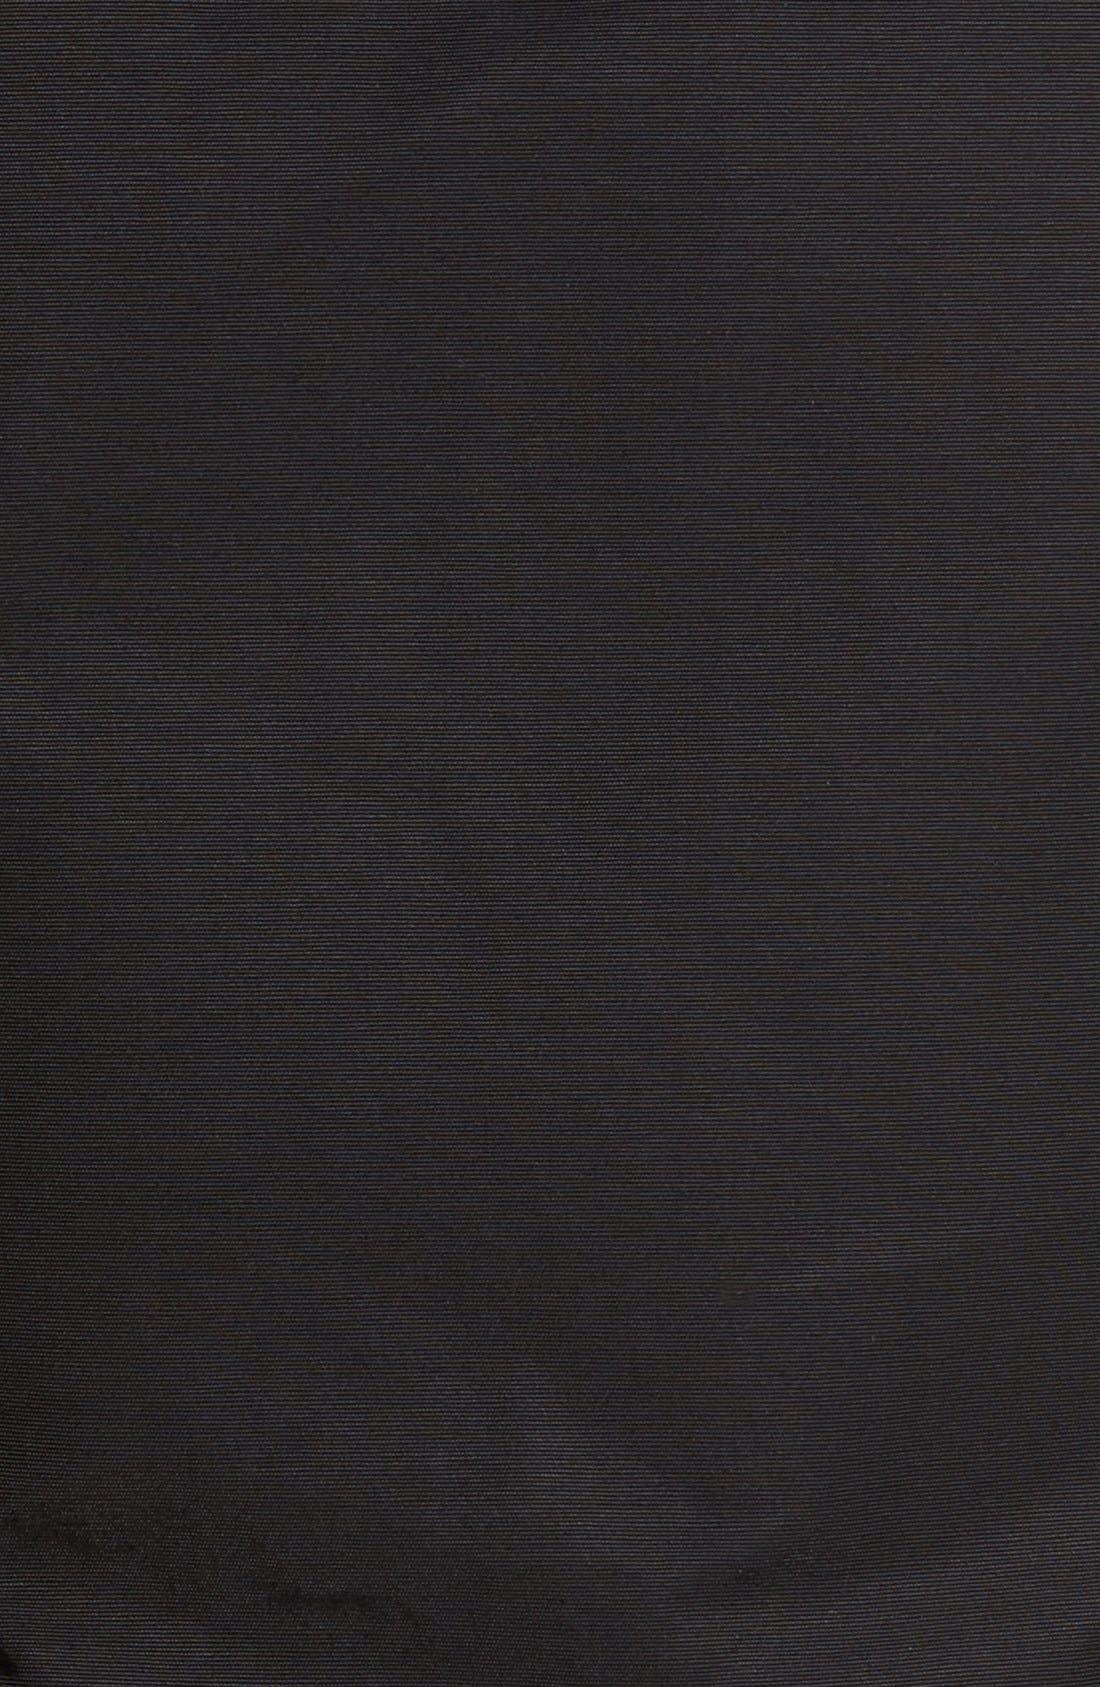 Stirling Water Repellent Down Parka with Genuine Fox Fur Trim,                             Alternate thumbnail 3, color,                             BLACK/ BLACK FUR